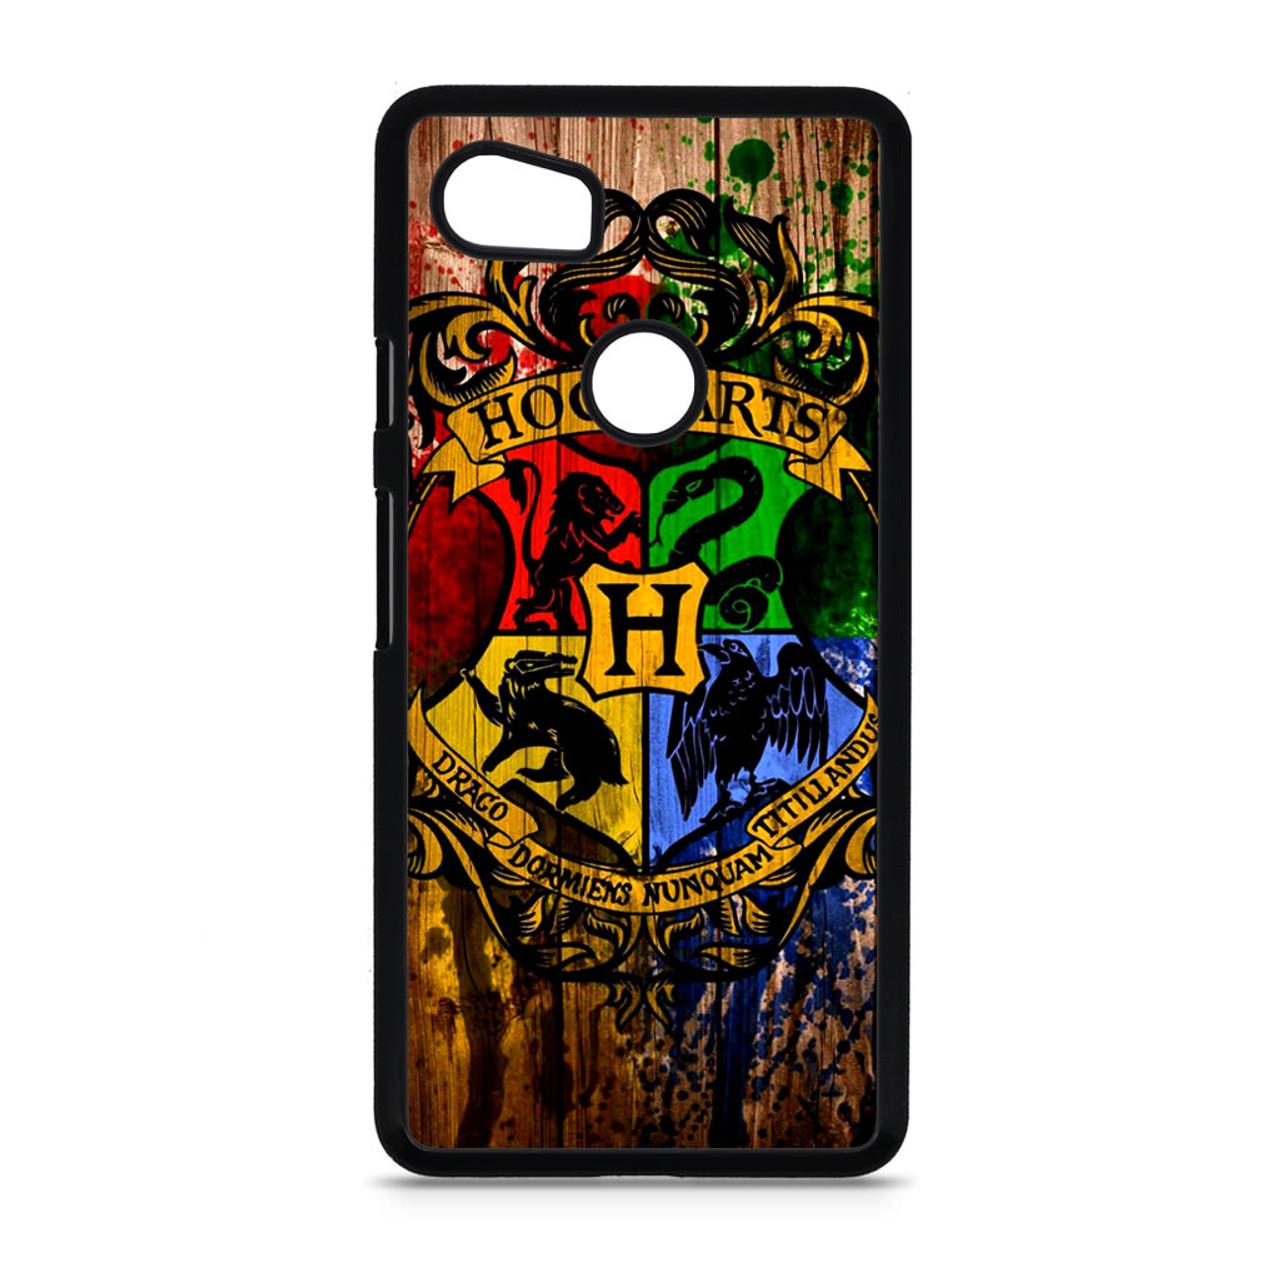 huge discount c700c 9c455 Harry Potter Hogwarts Google Pixel 2 XL Case